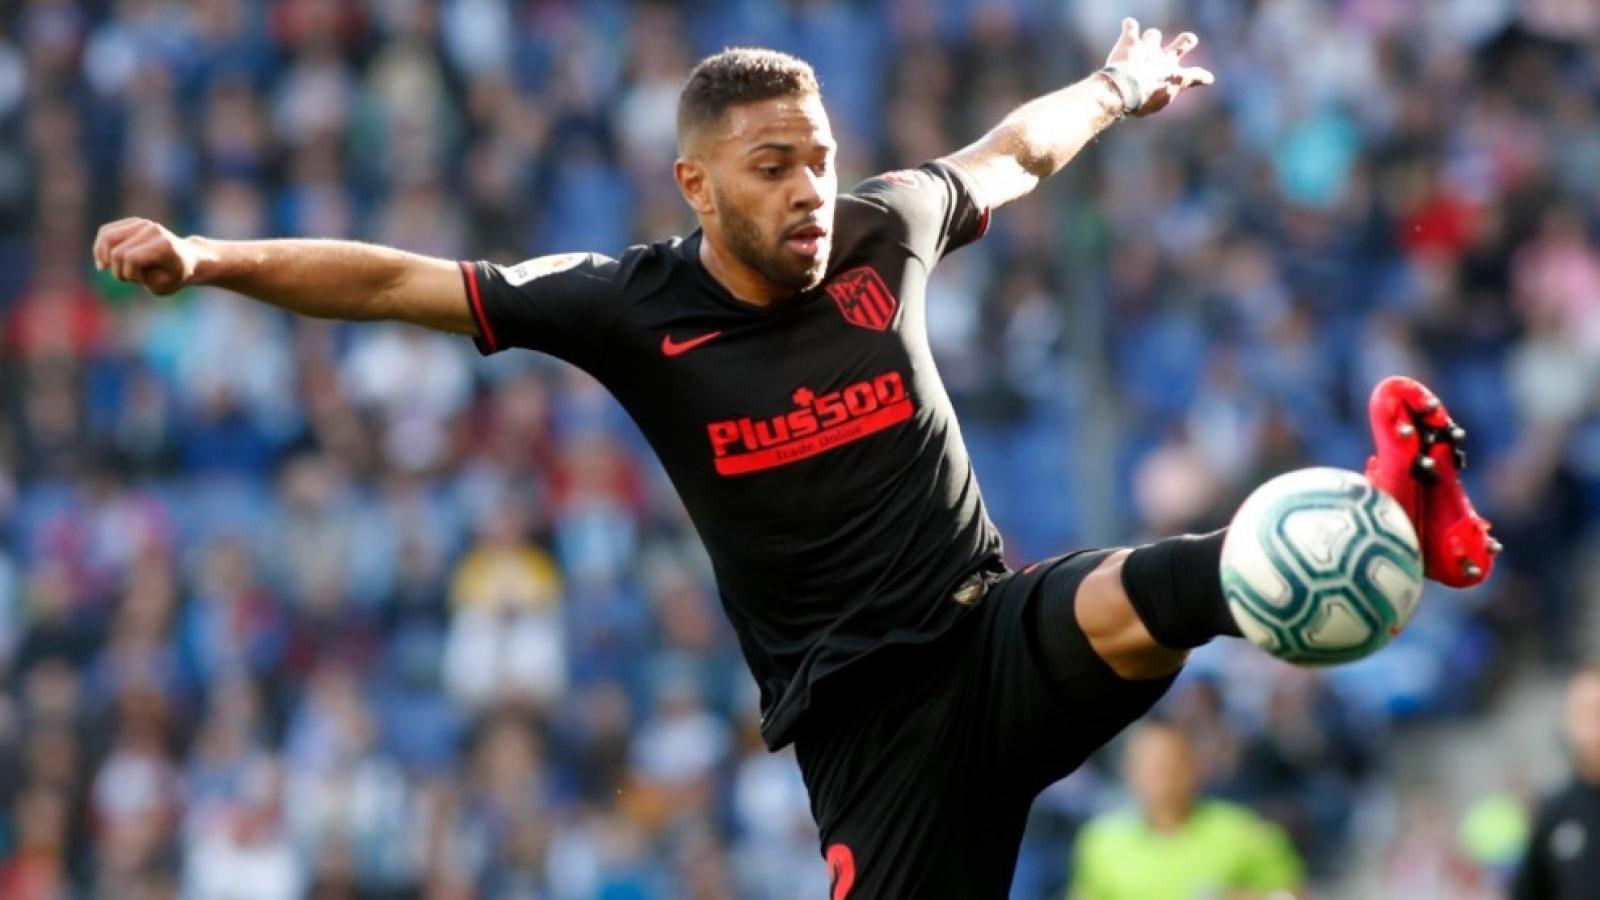 Hậu vệ Renan Lodi của Atletico Madrid mắc Covid-19